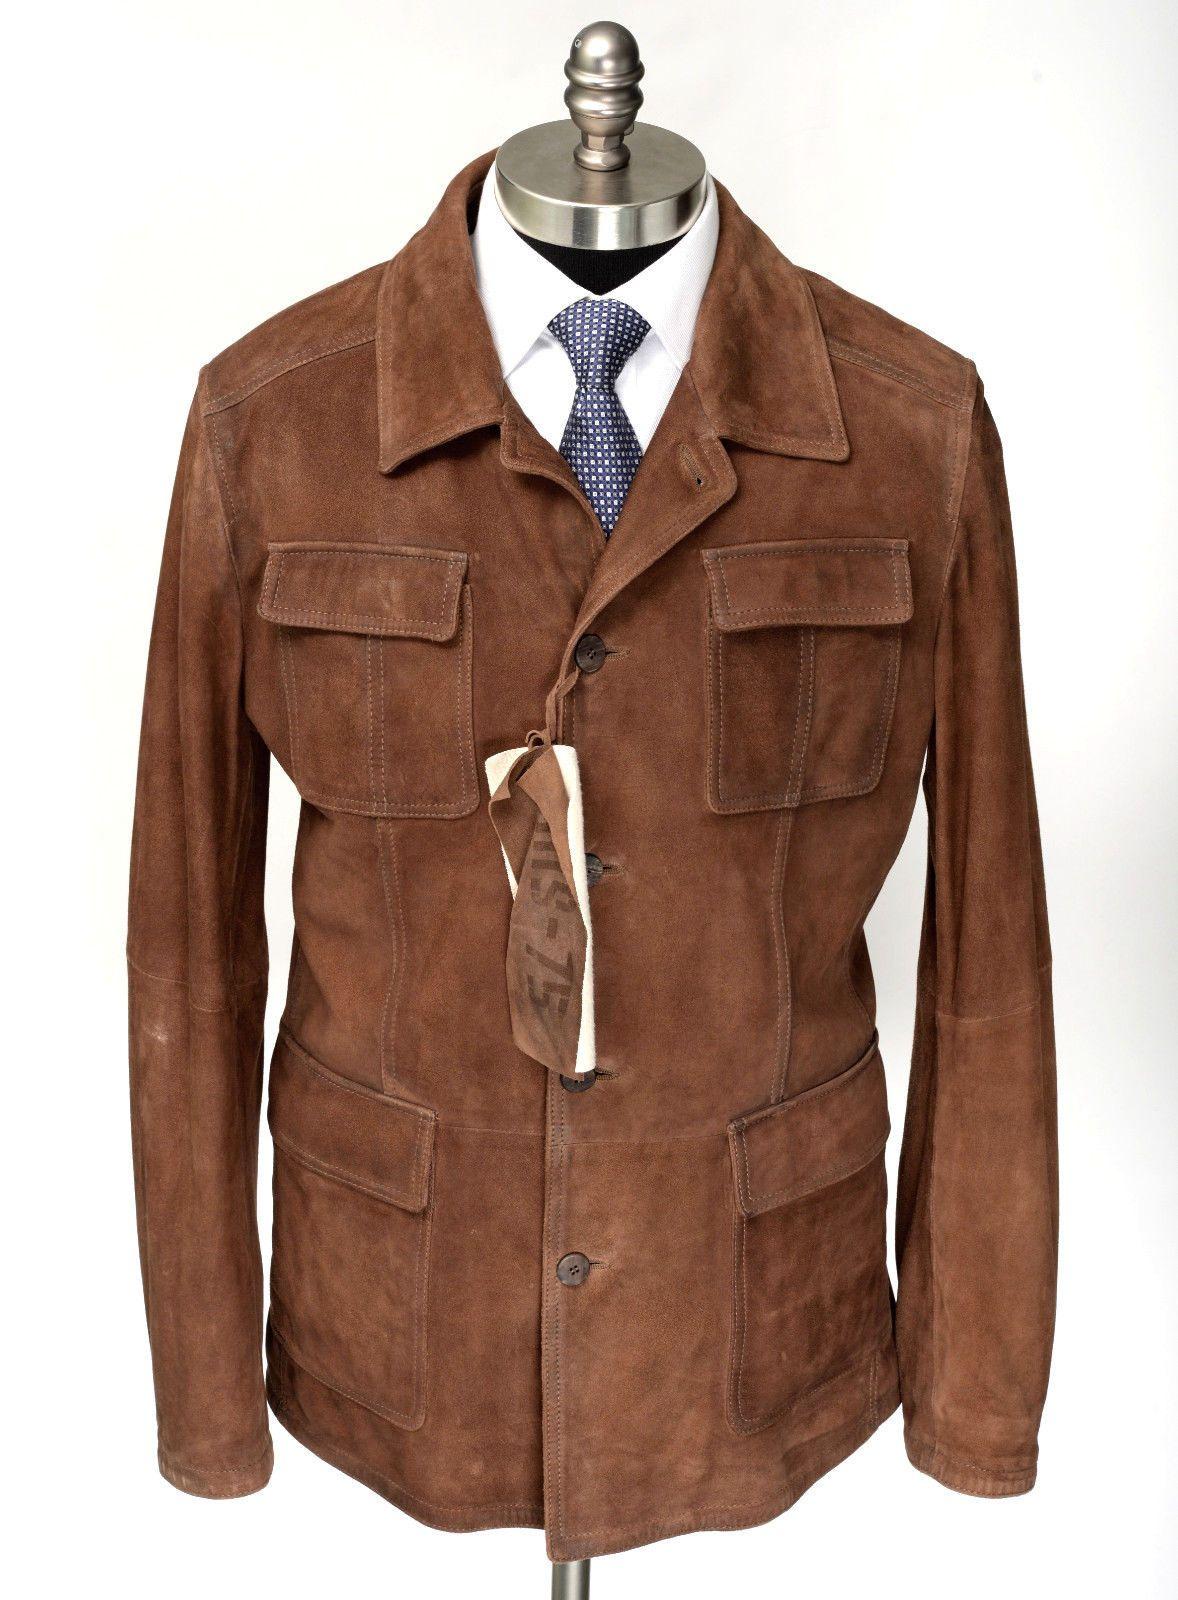 Gimo S Gms 75 Goat Suede Leather Slim 5btn Coat Jacket Kurtka Muzhskoj Stil Odezhda